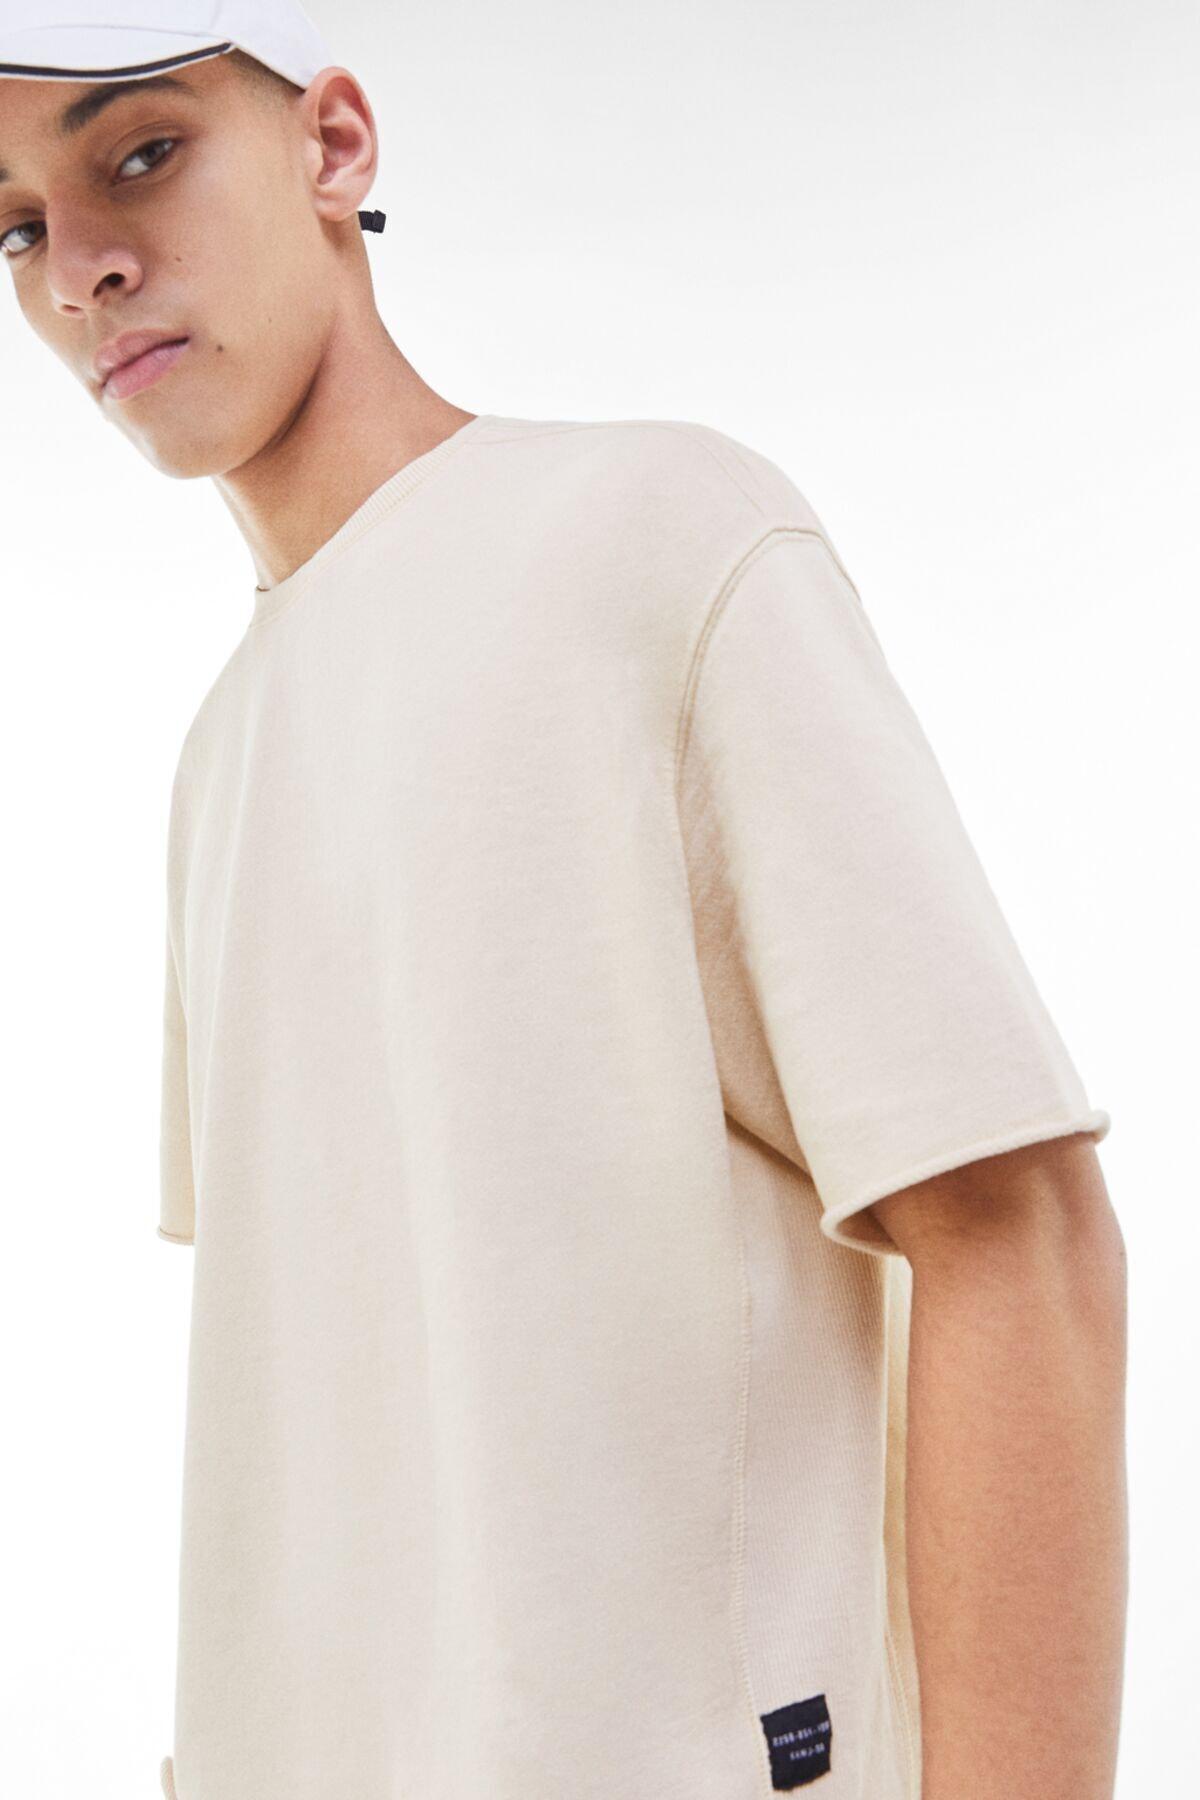 Bershka Erkek Kum Rengi Soluk Efektli Pamuklu T-Shirt 02406240 2